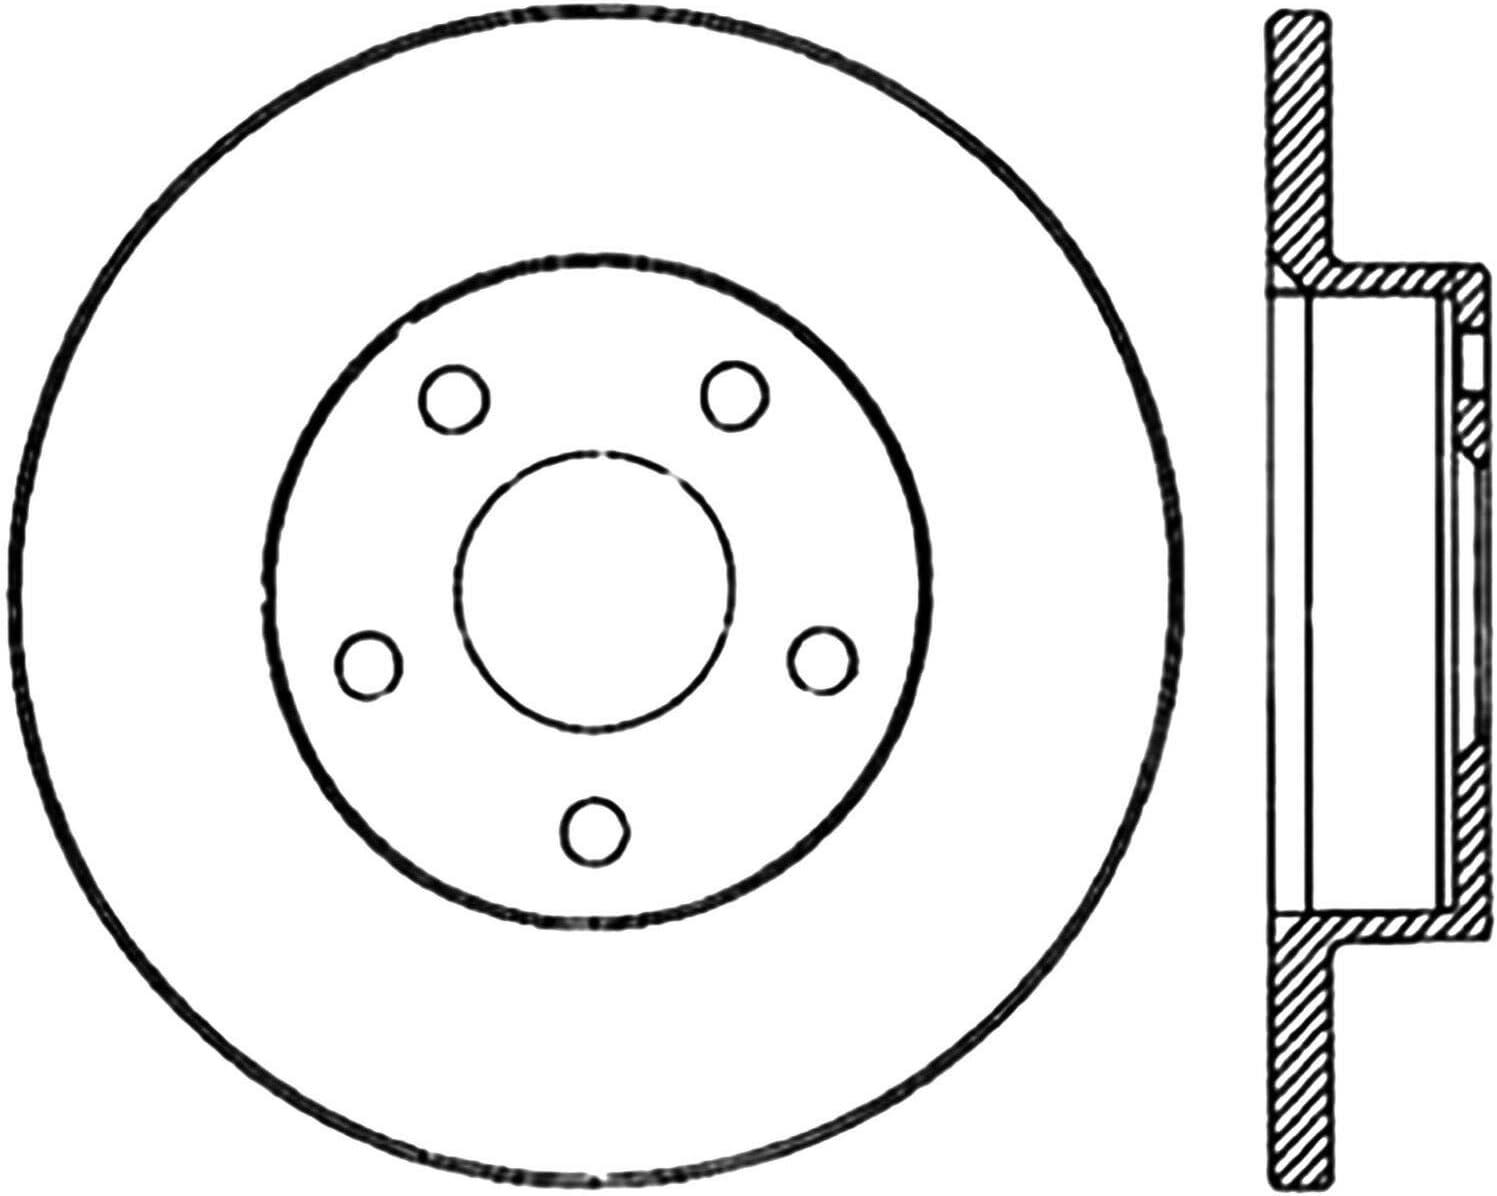 Centric Parts 123.62009 Brake Drum